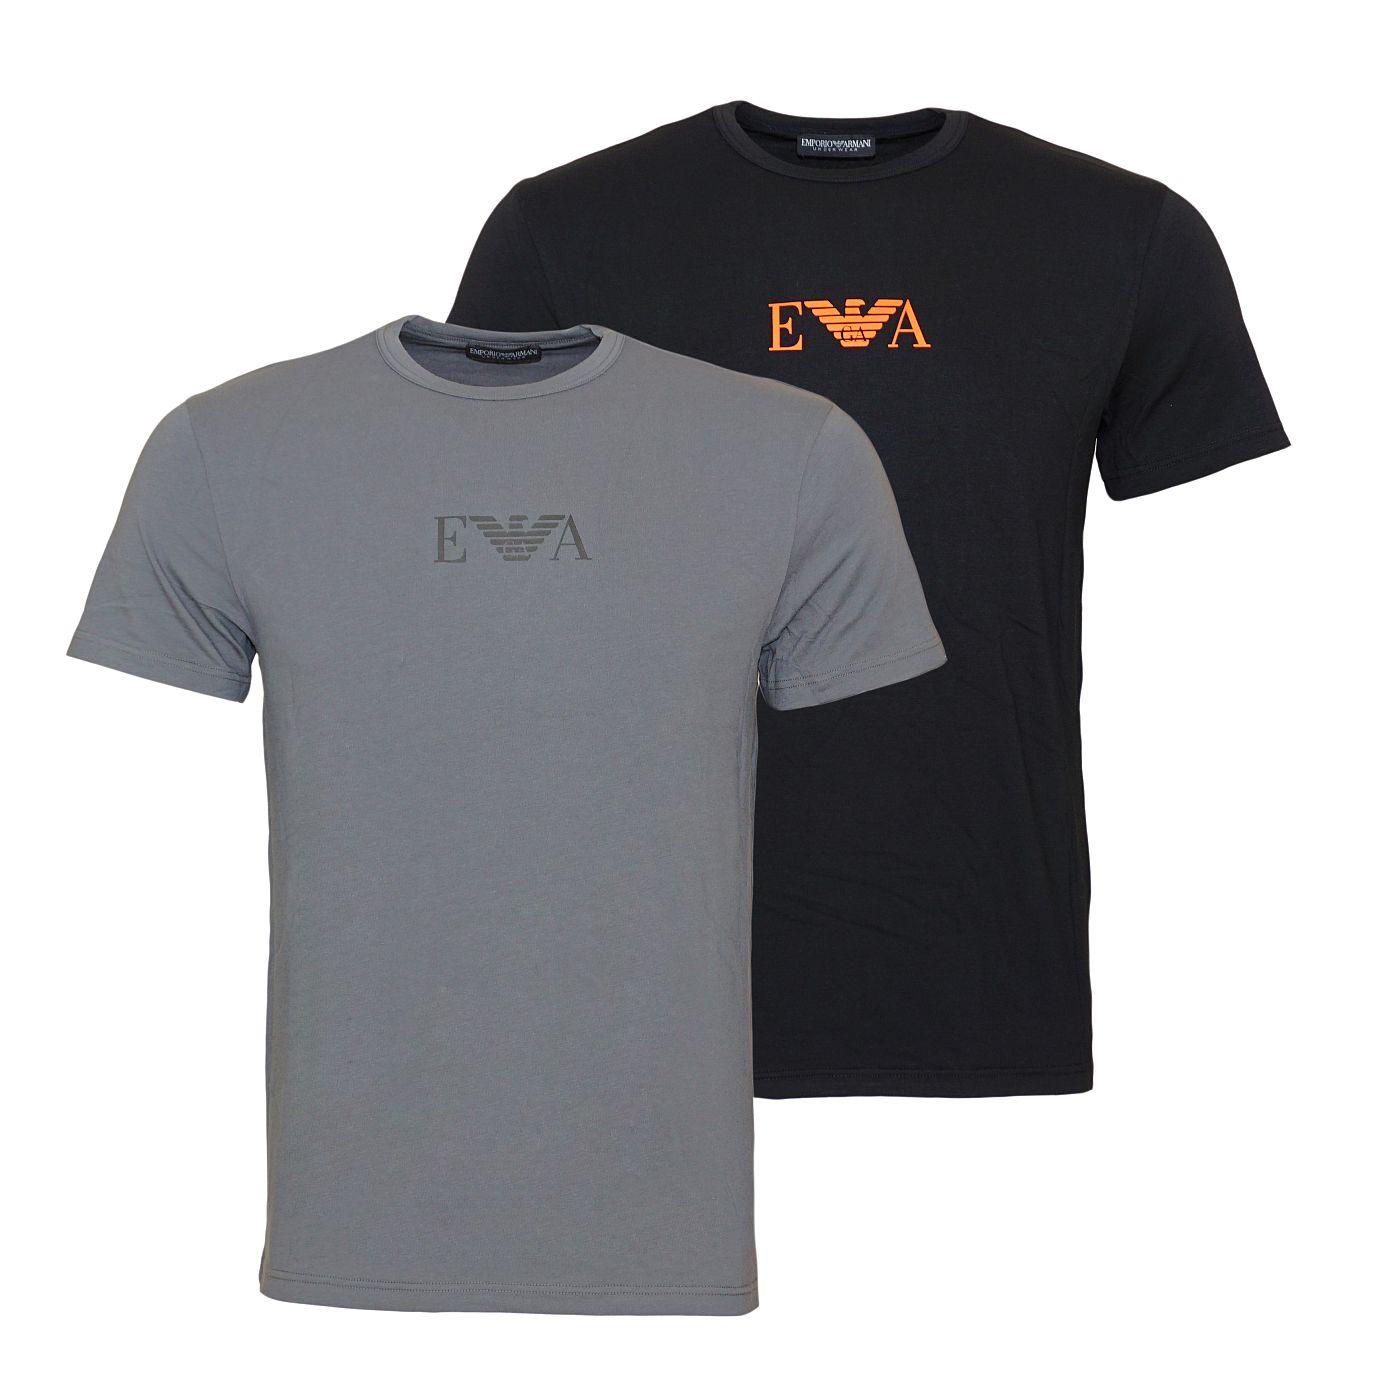 Emporio Armani 2er Pack T-Shirts Rundhals 111267 8A715 41720 NERO/ANTRACITE SH18-EAT1